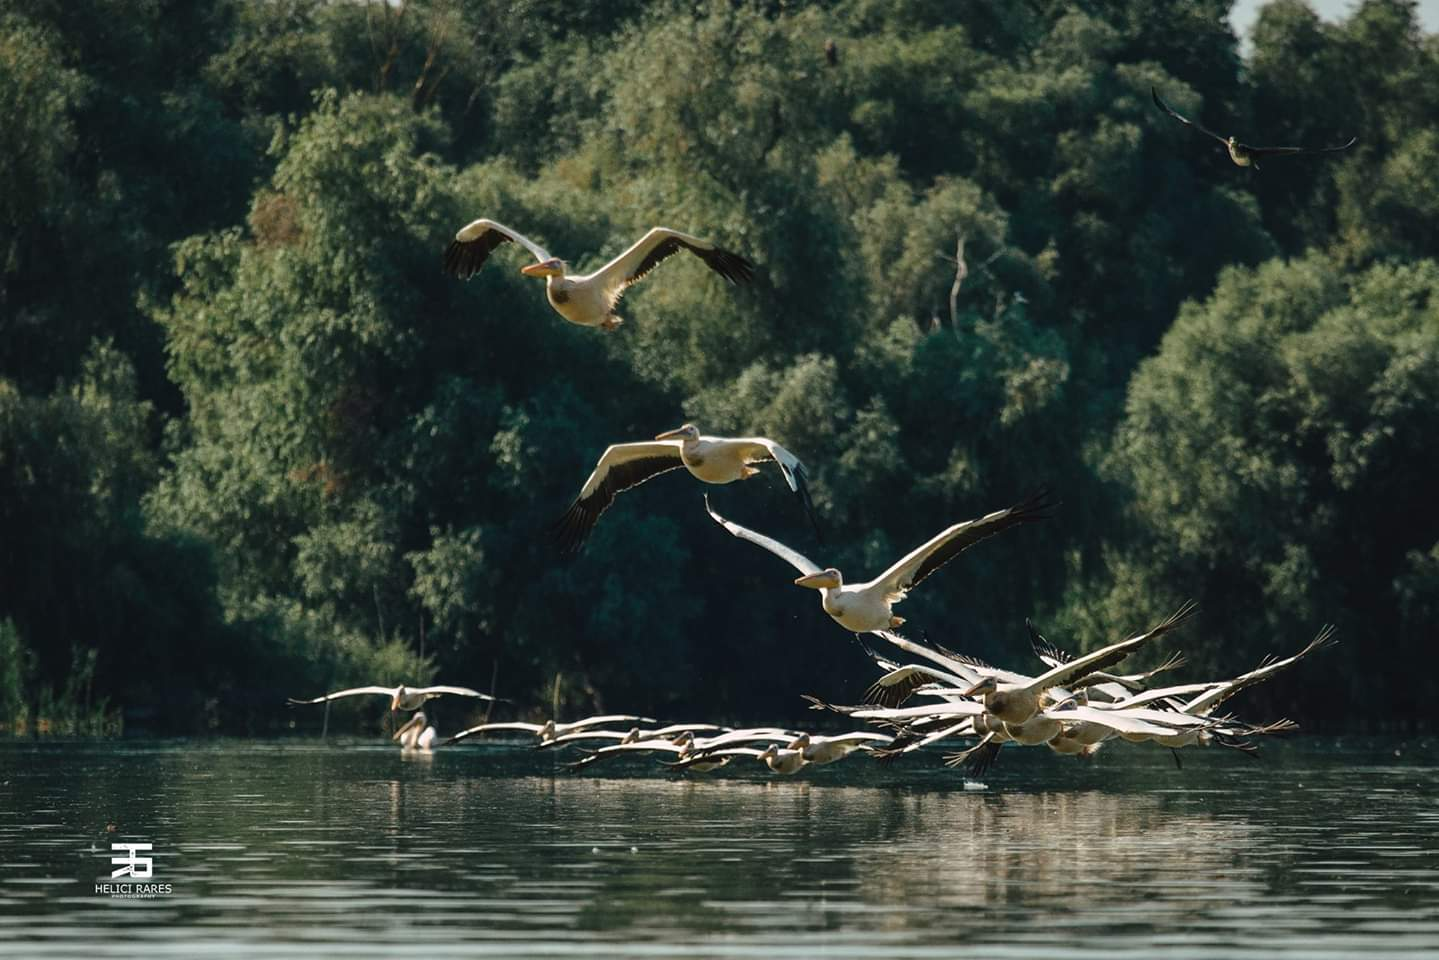 colonie-pelicani-6